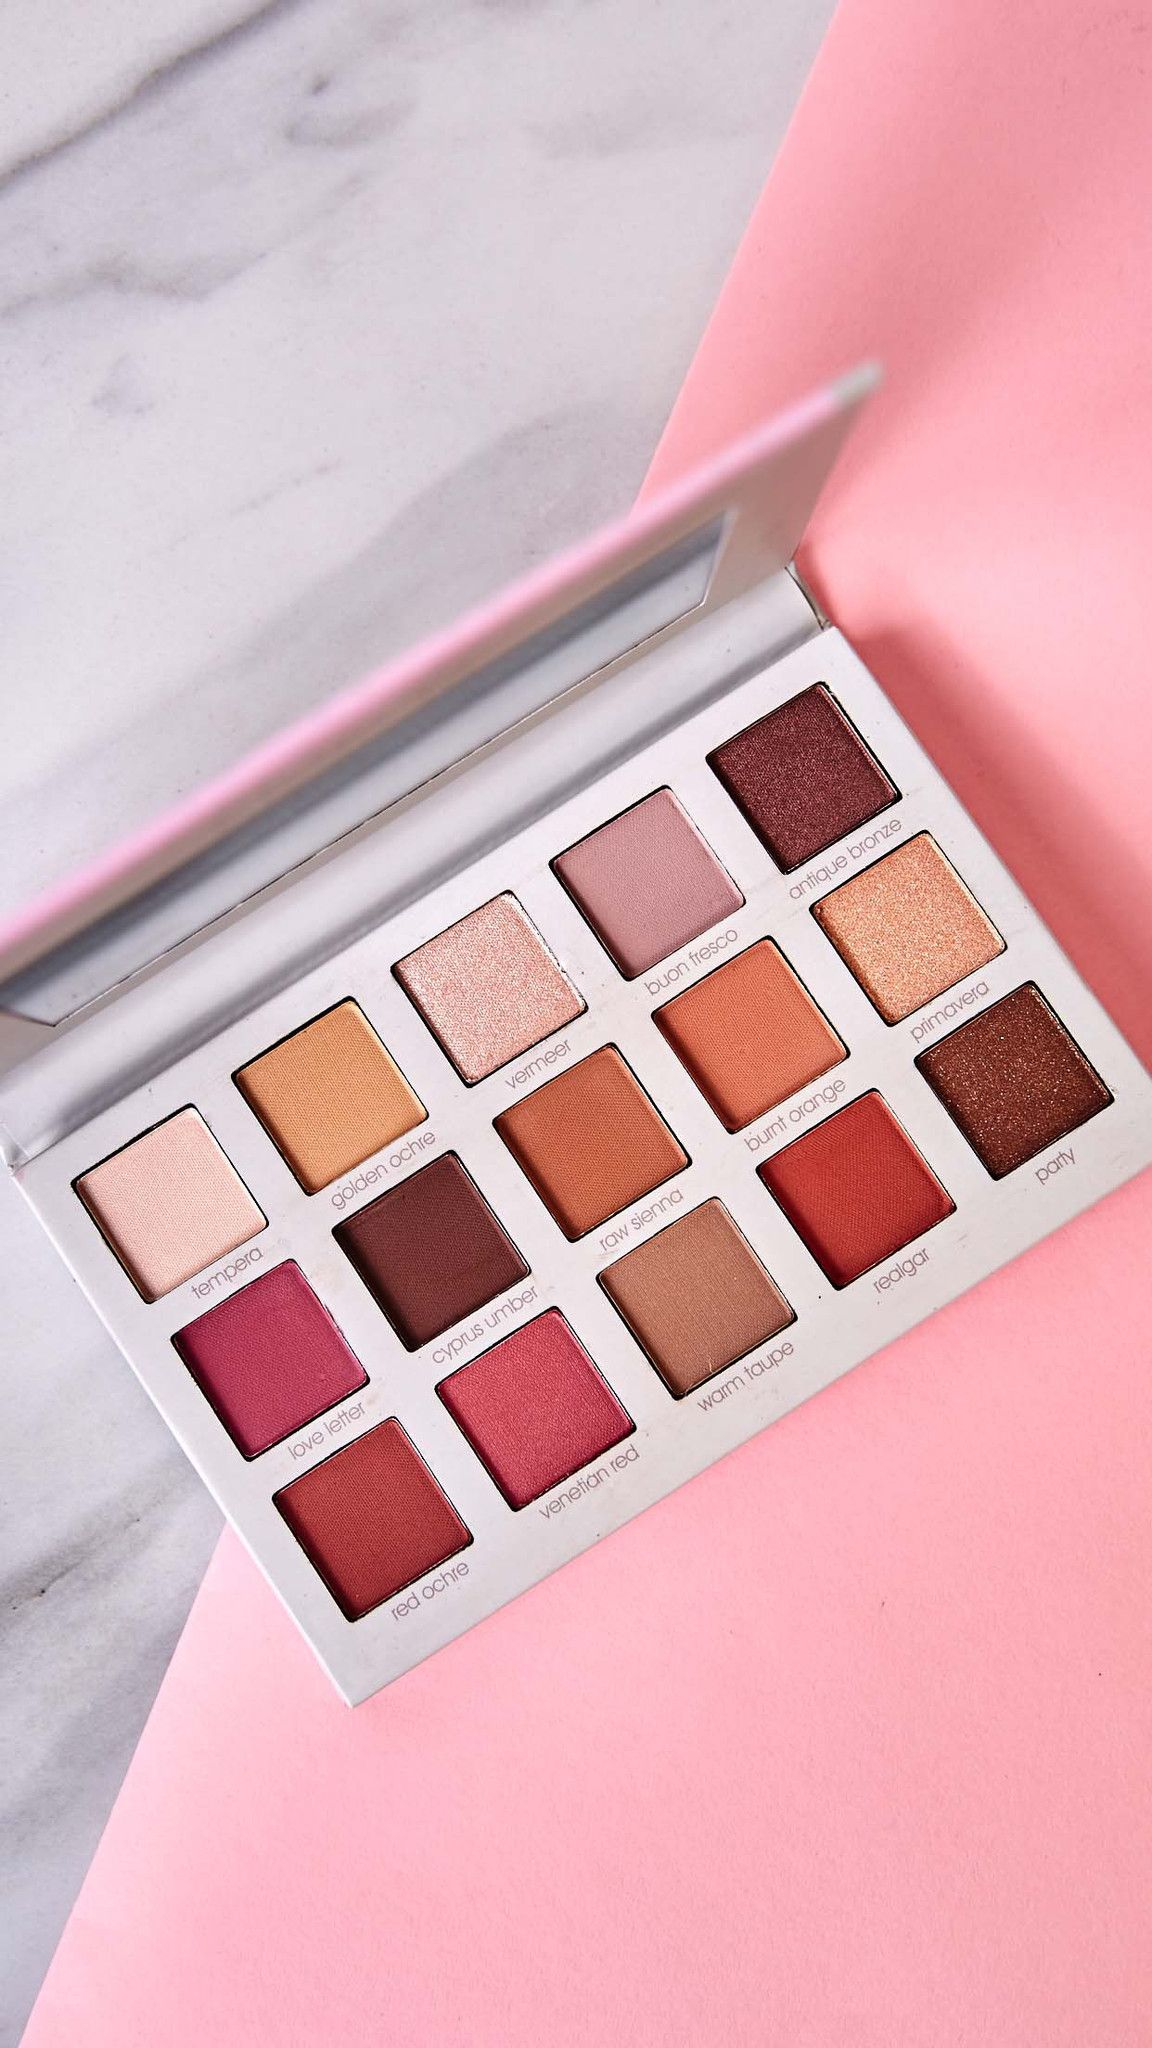 Irresistible Eyeshadow Palette